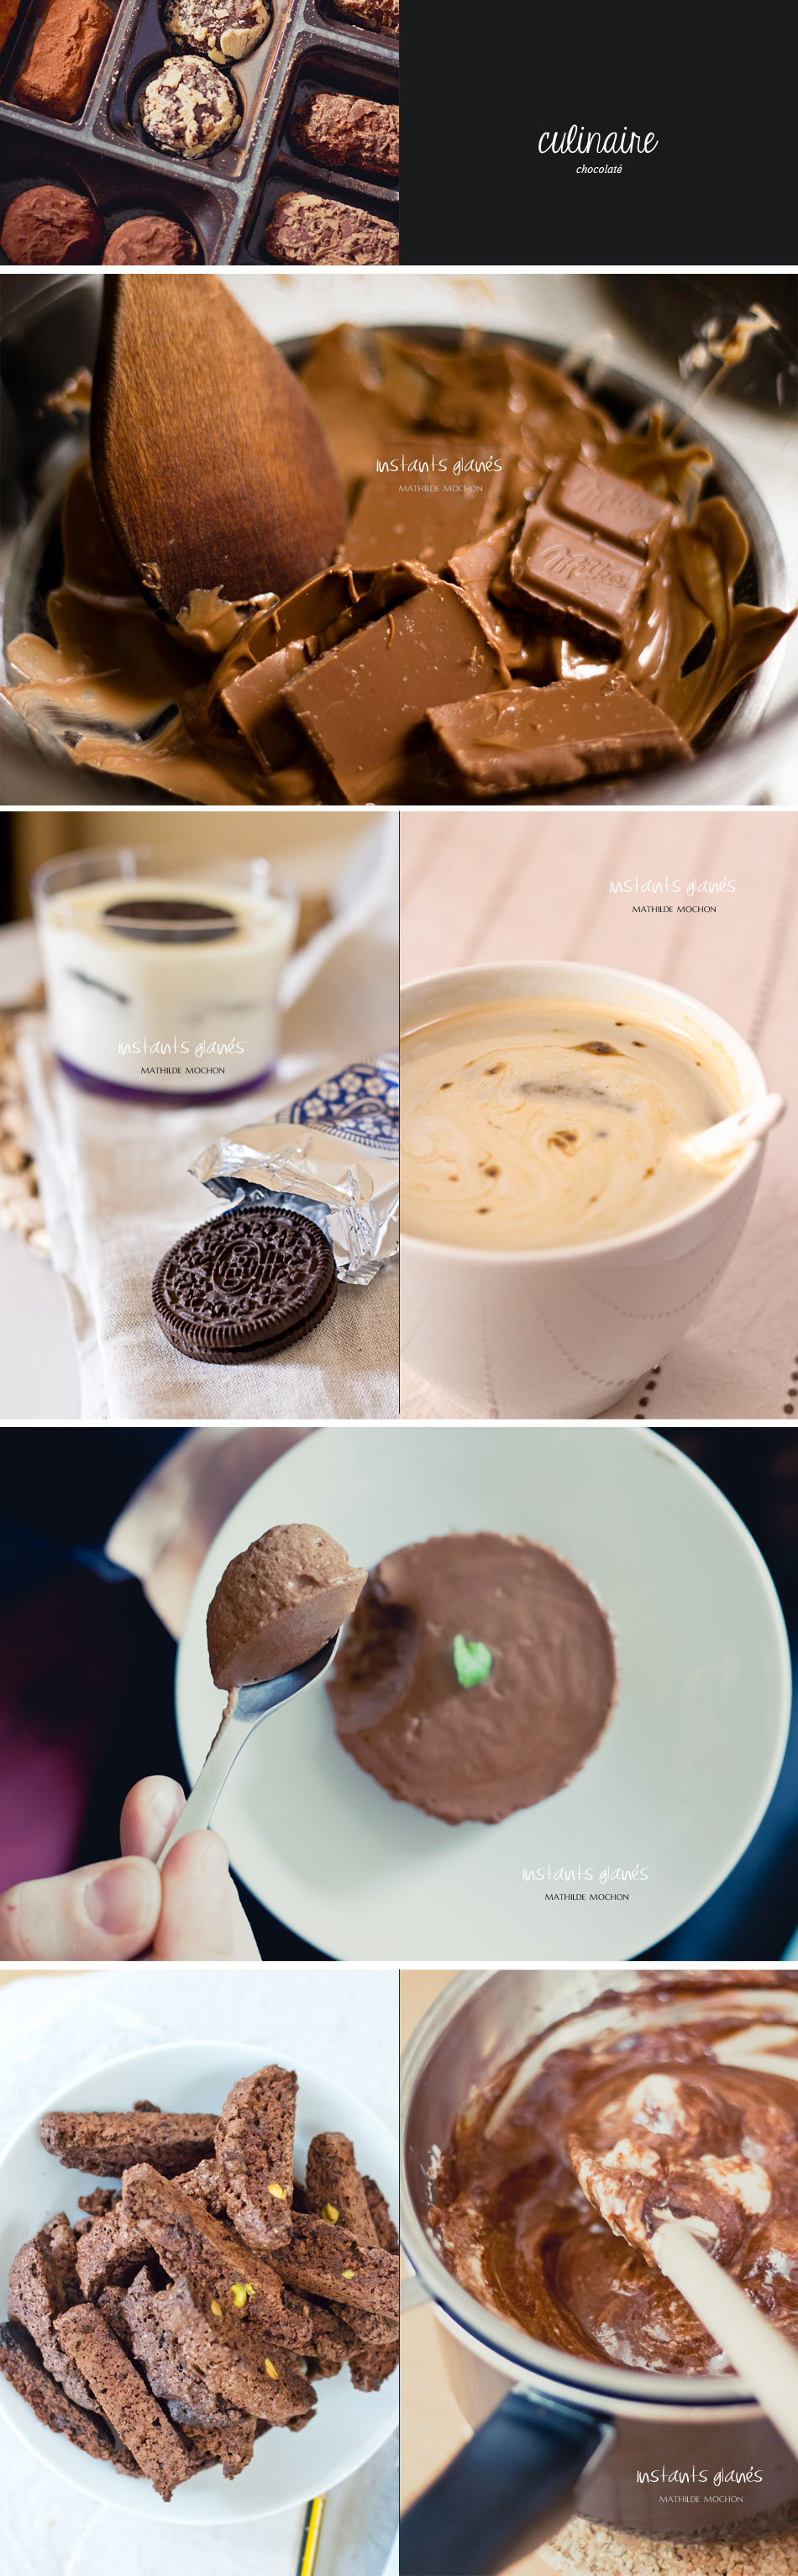 culinaire-chocolat